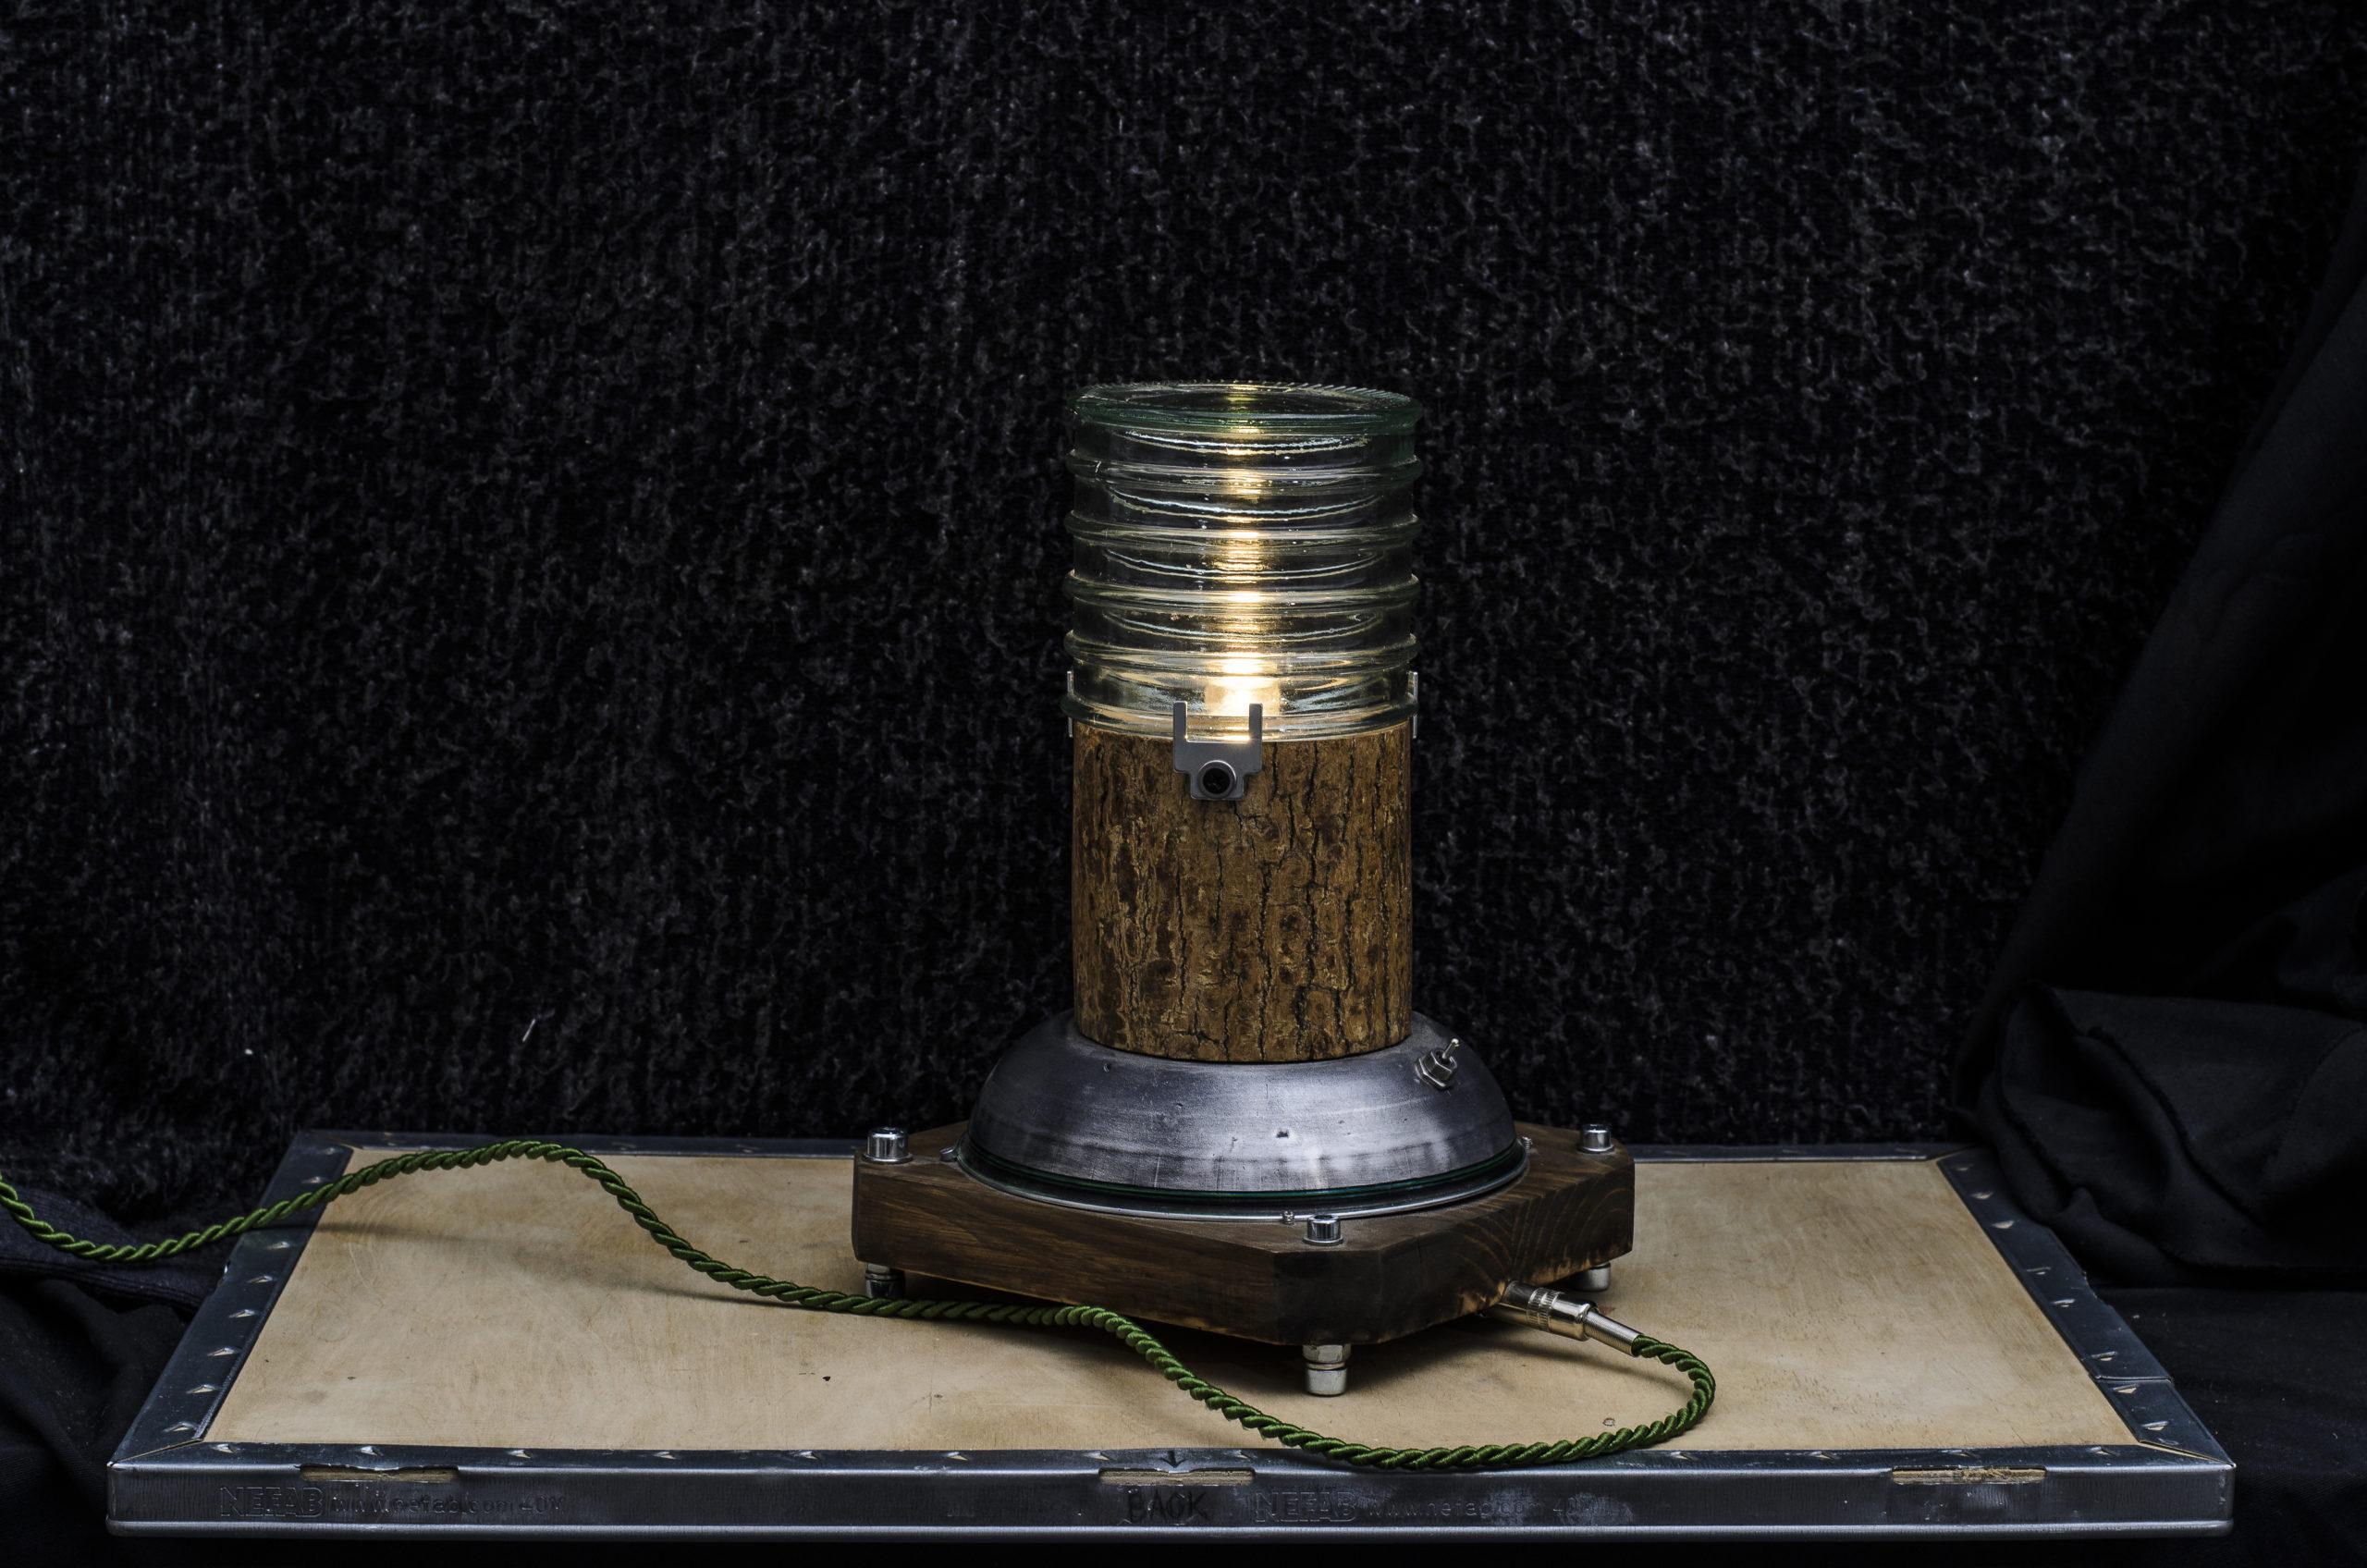 LIGTH HOUS LAMP 1 ART BY CHEM 2